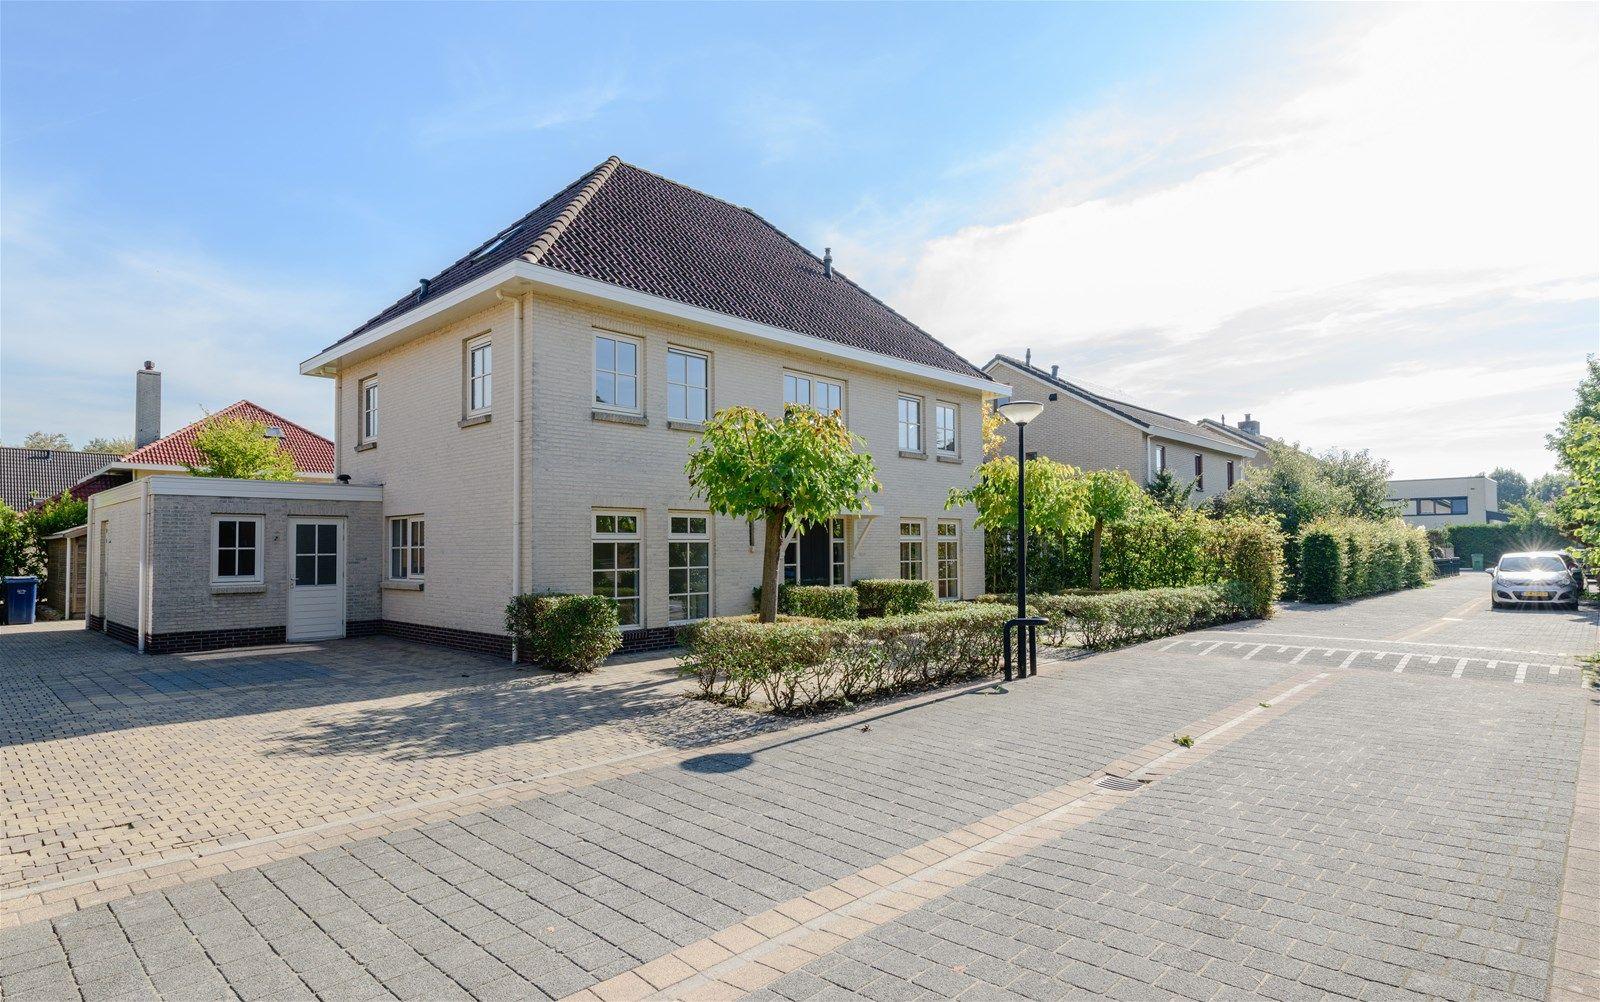 Gasthuisstraat 6, Almere